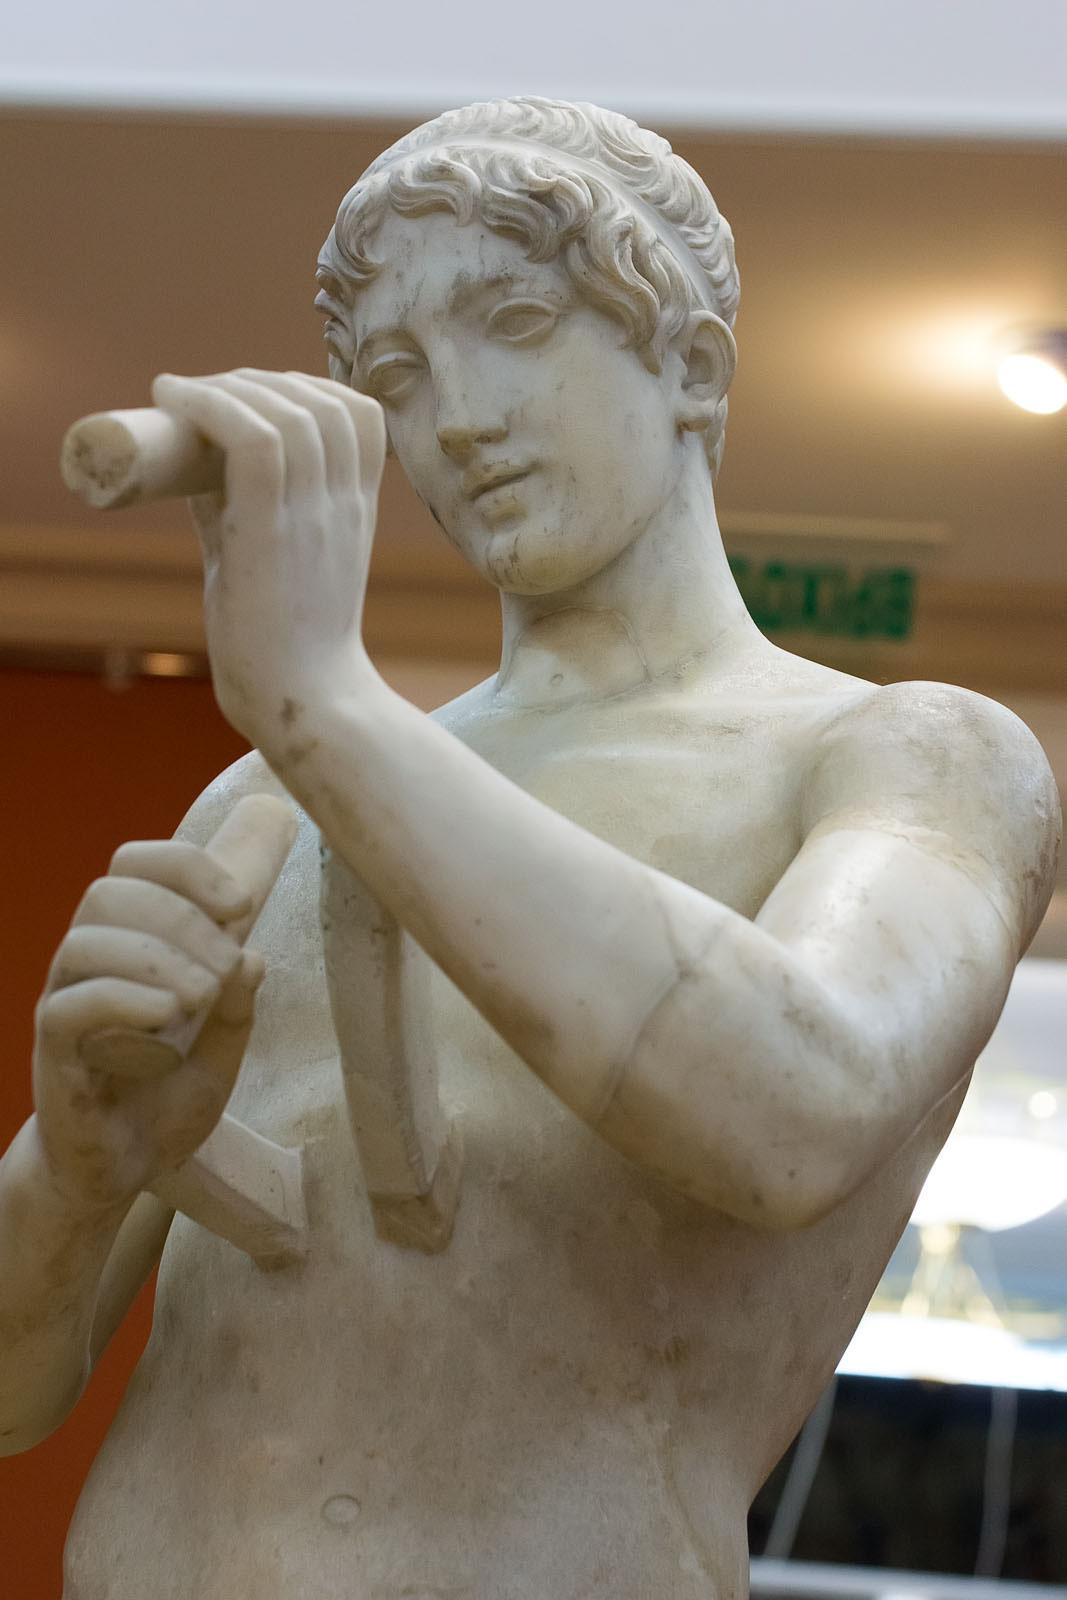 Фото №149885. Статуя юноши-атлета с двойной флейтой